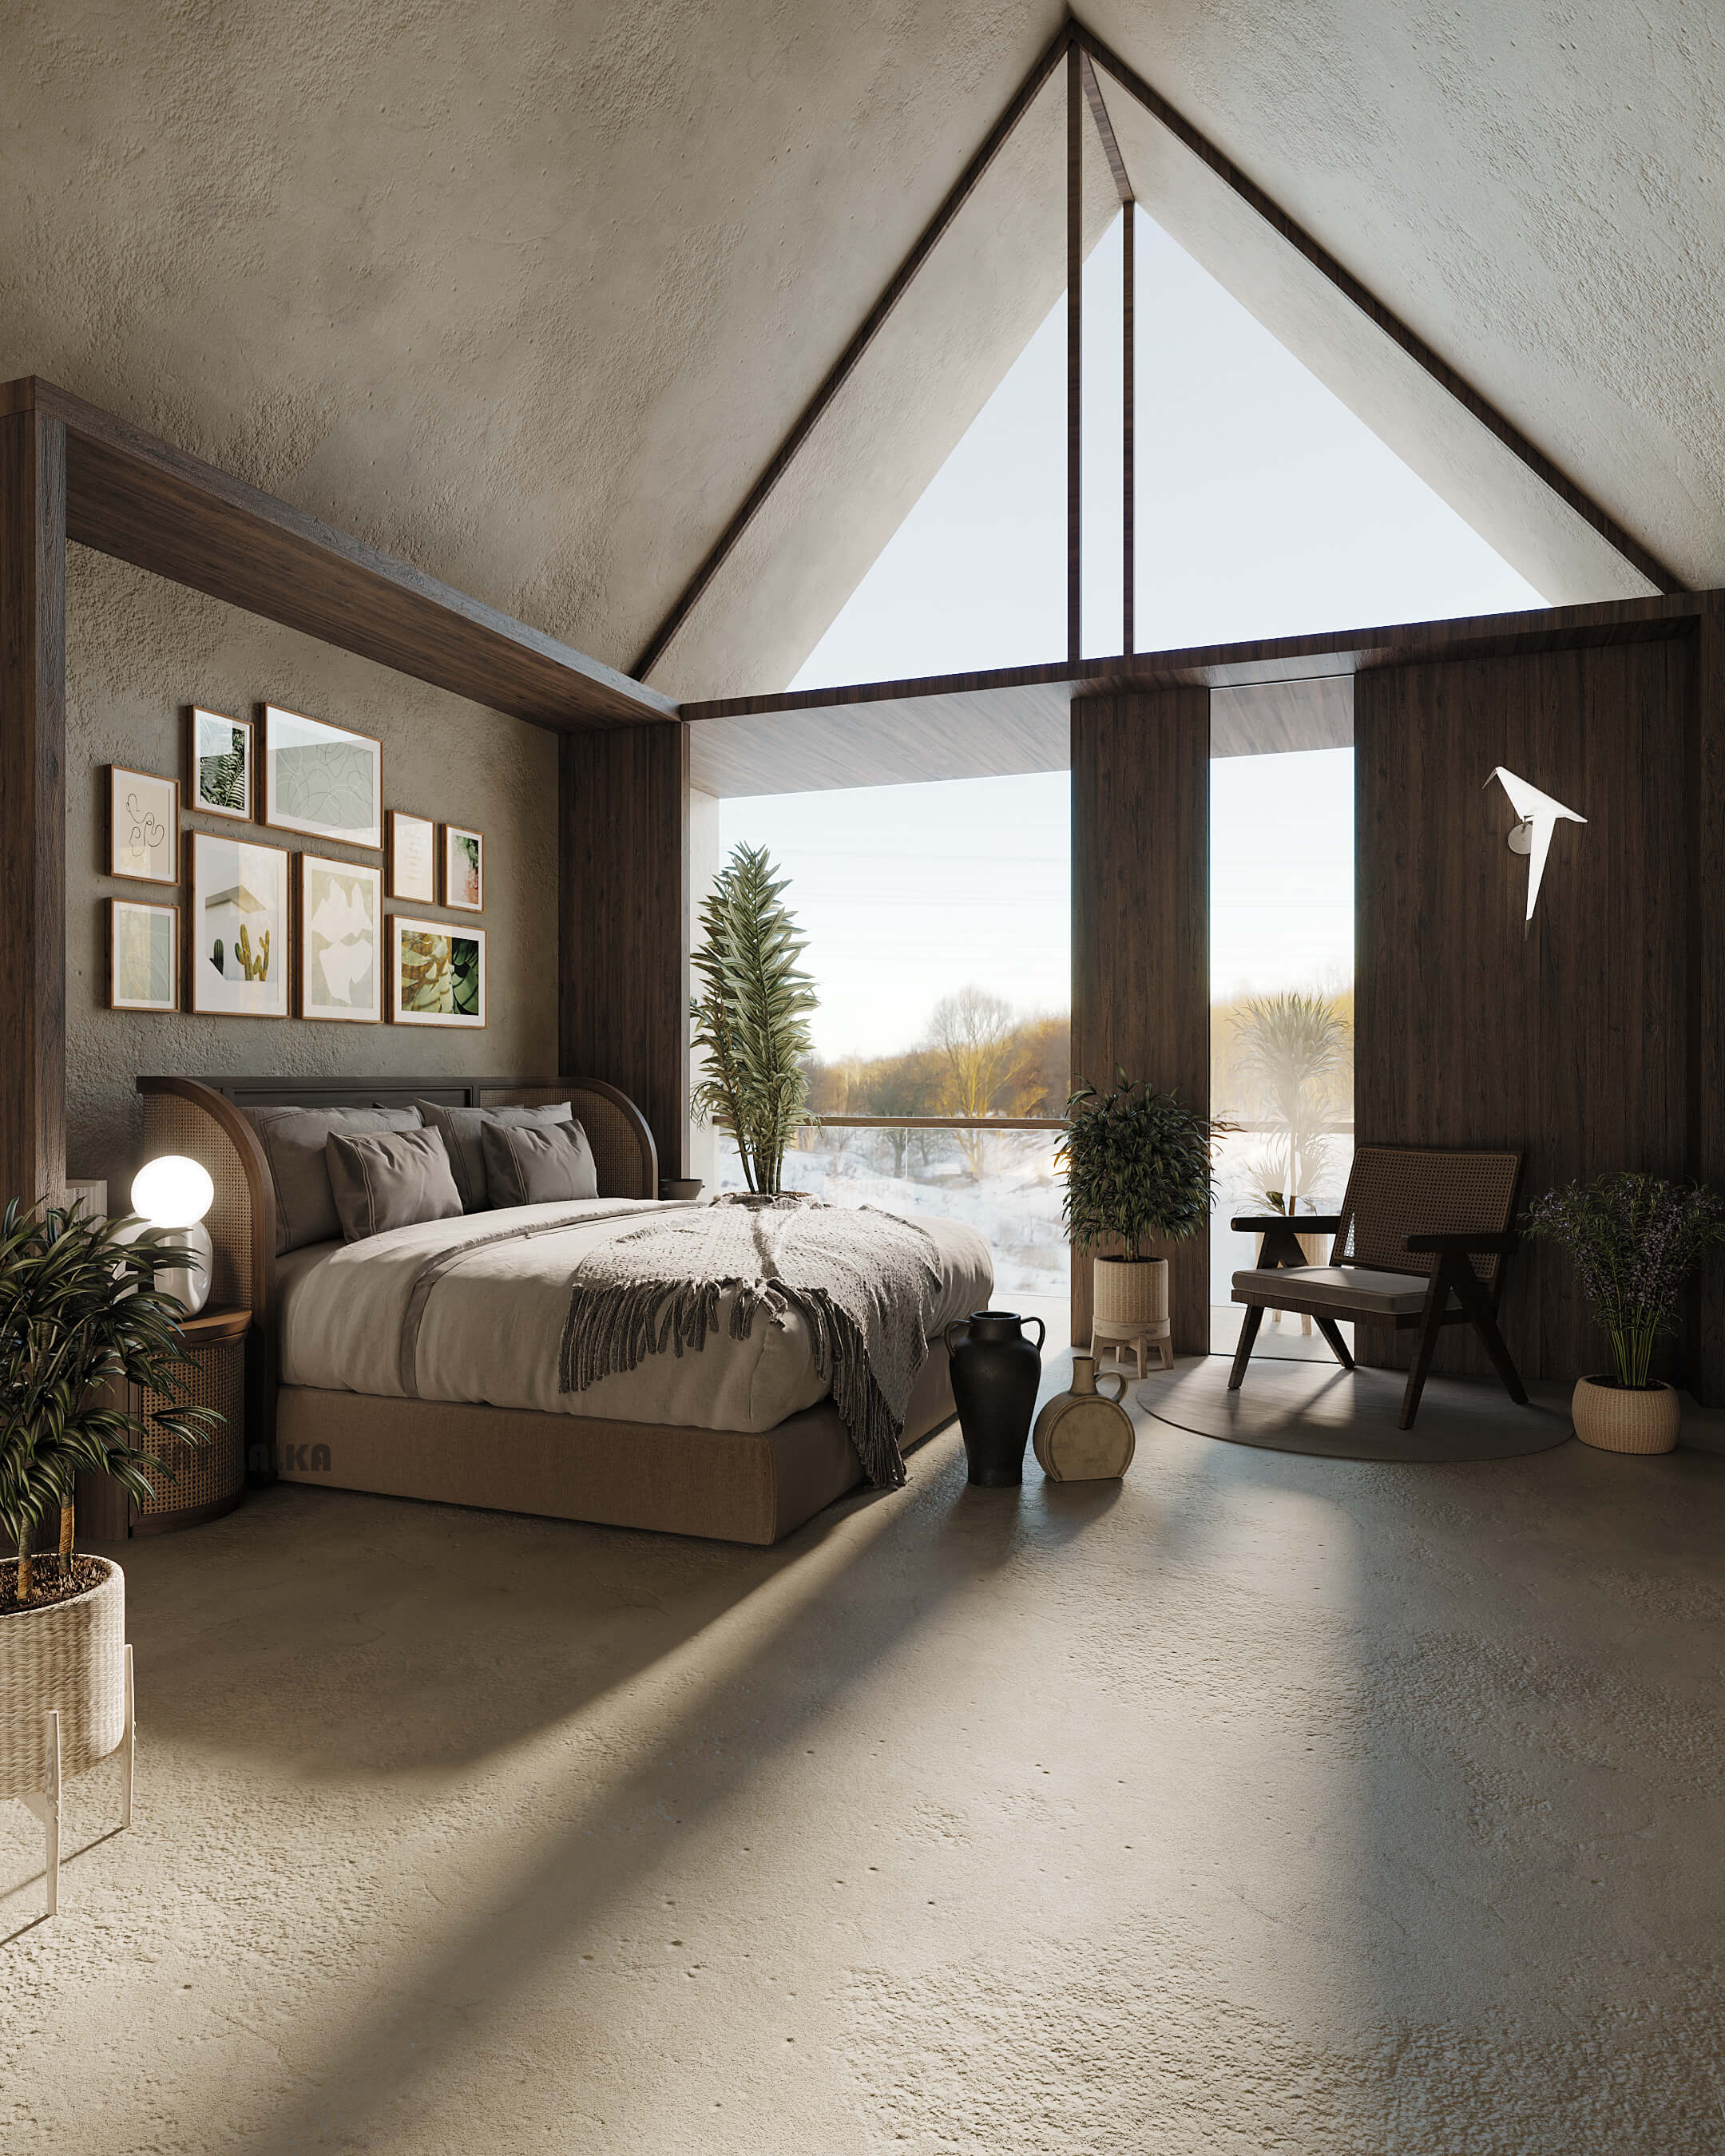 Barn House Visualization by Jay Lalka